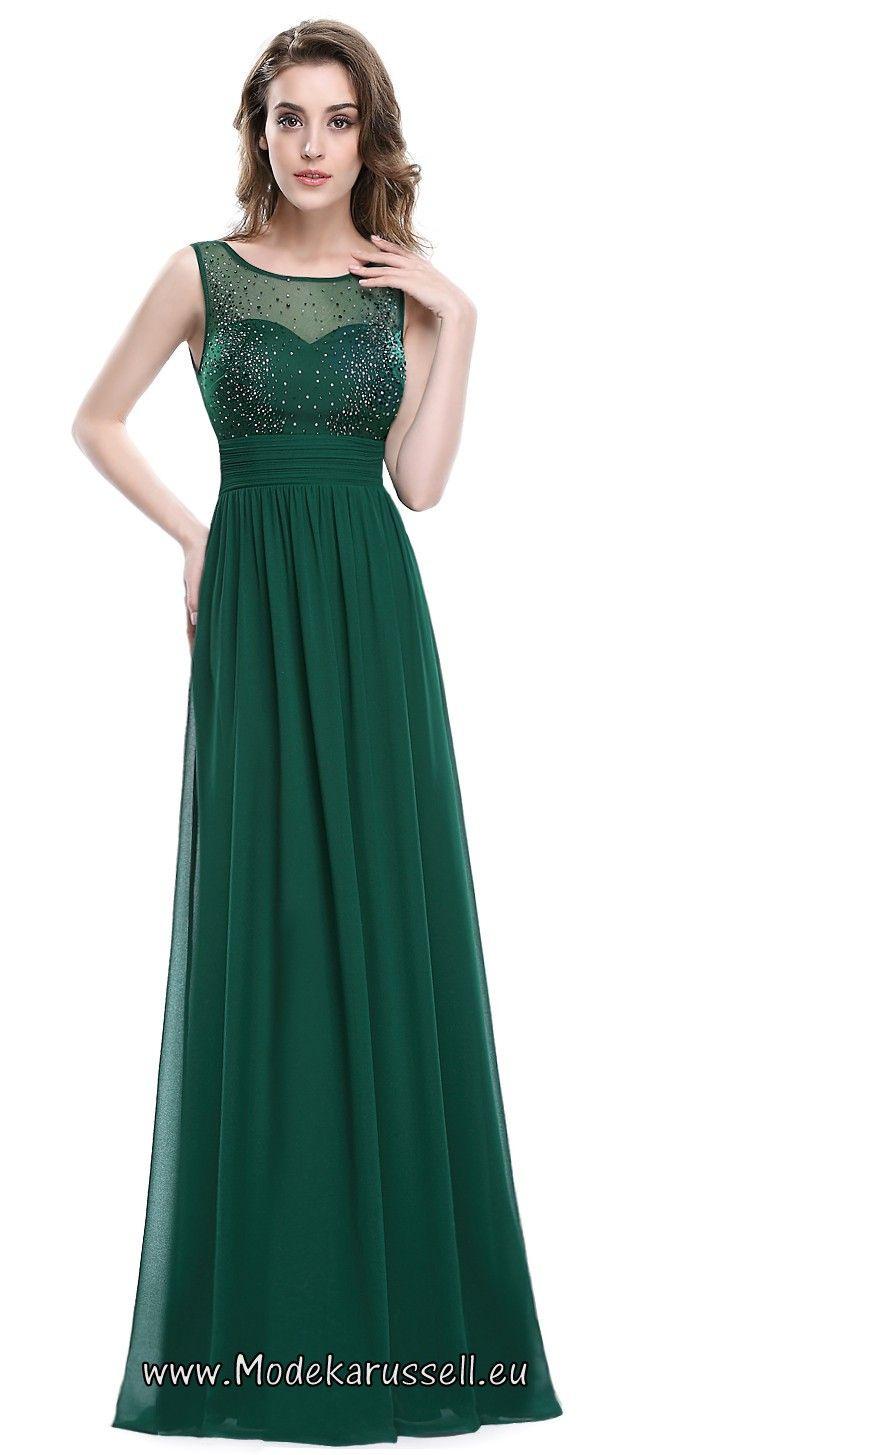 Formal Leicht Grünes Abend Kleid Stylish Genial Grünes Abend Kleid Boutique